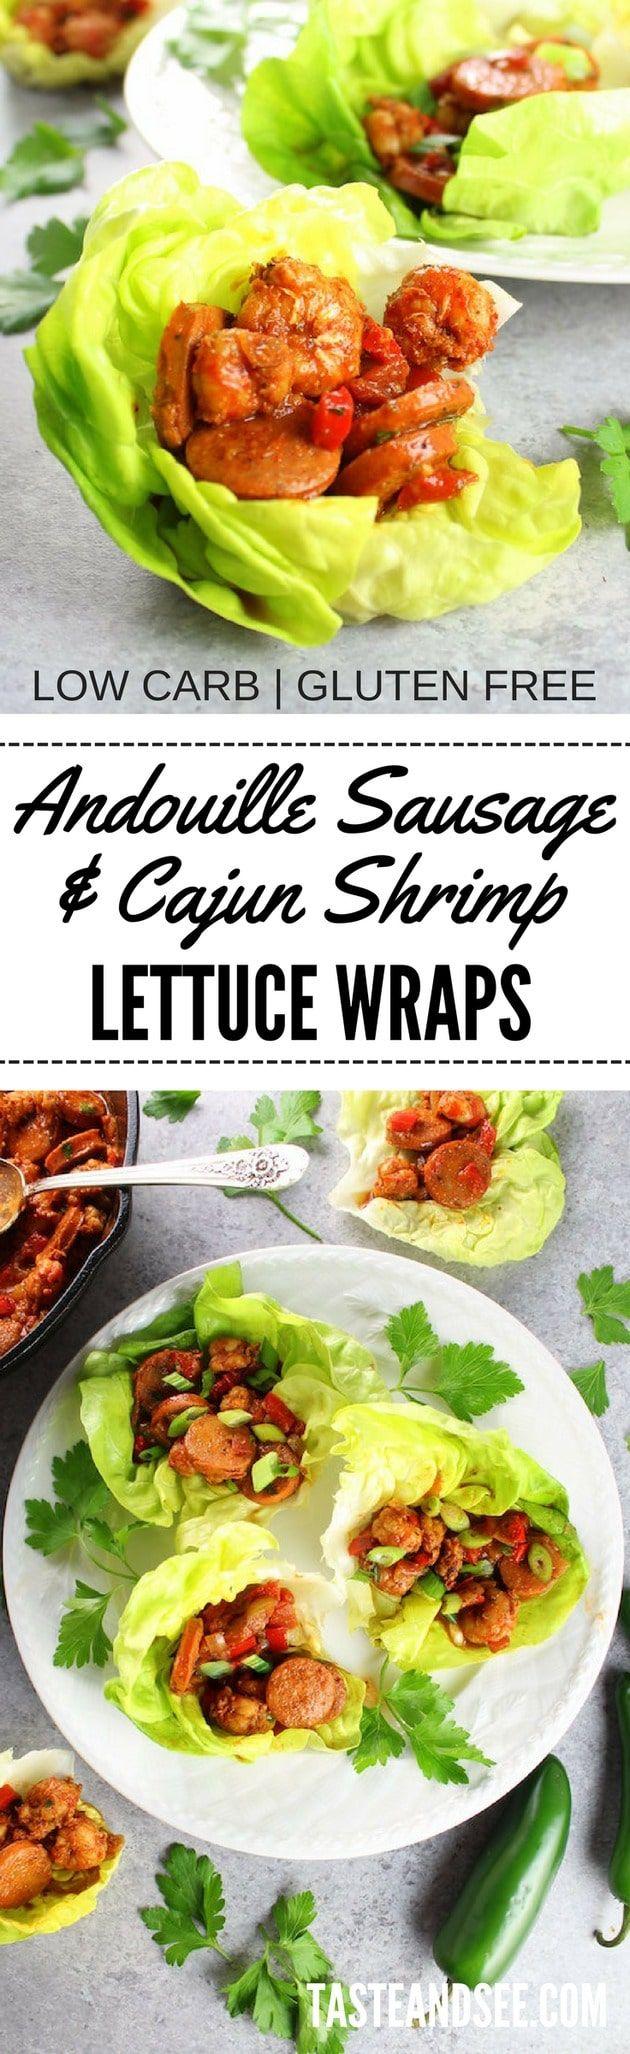 Andouille Sausage and Cajun Shrimp Lettuce Wraps!  Low carb | Gluten-free | http://tasteandsee.com via @h_tasteandsee